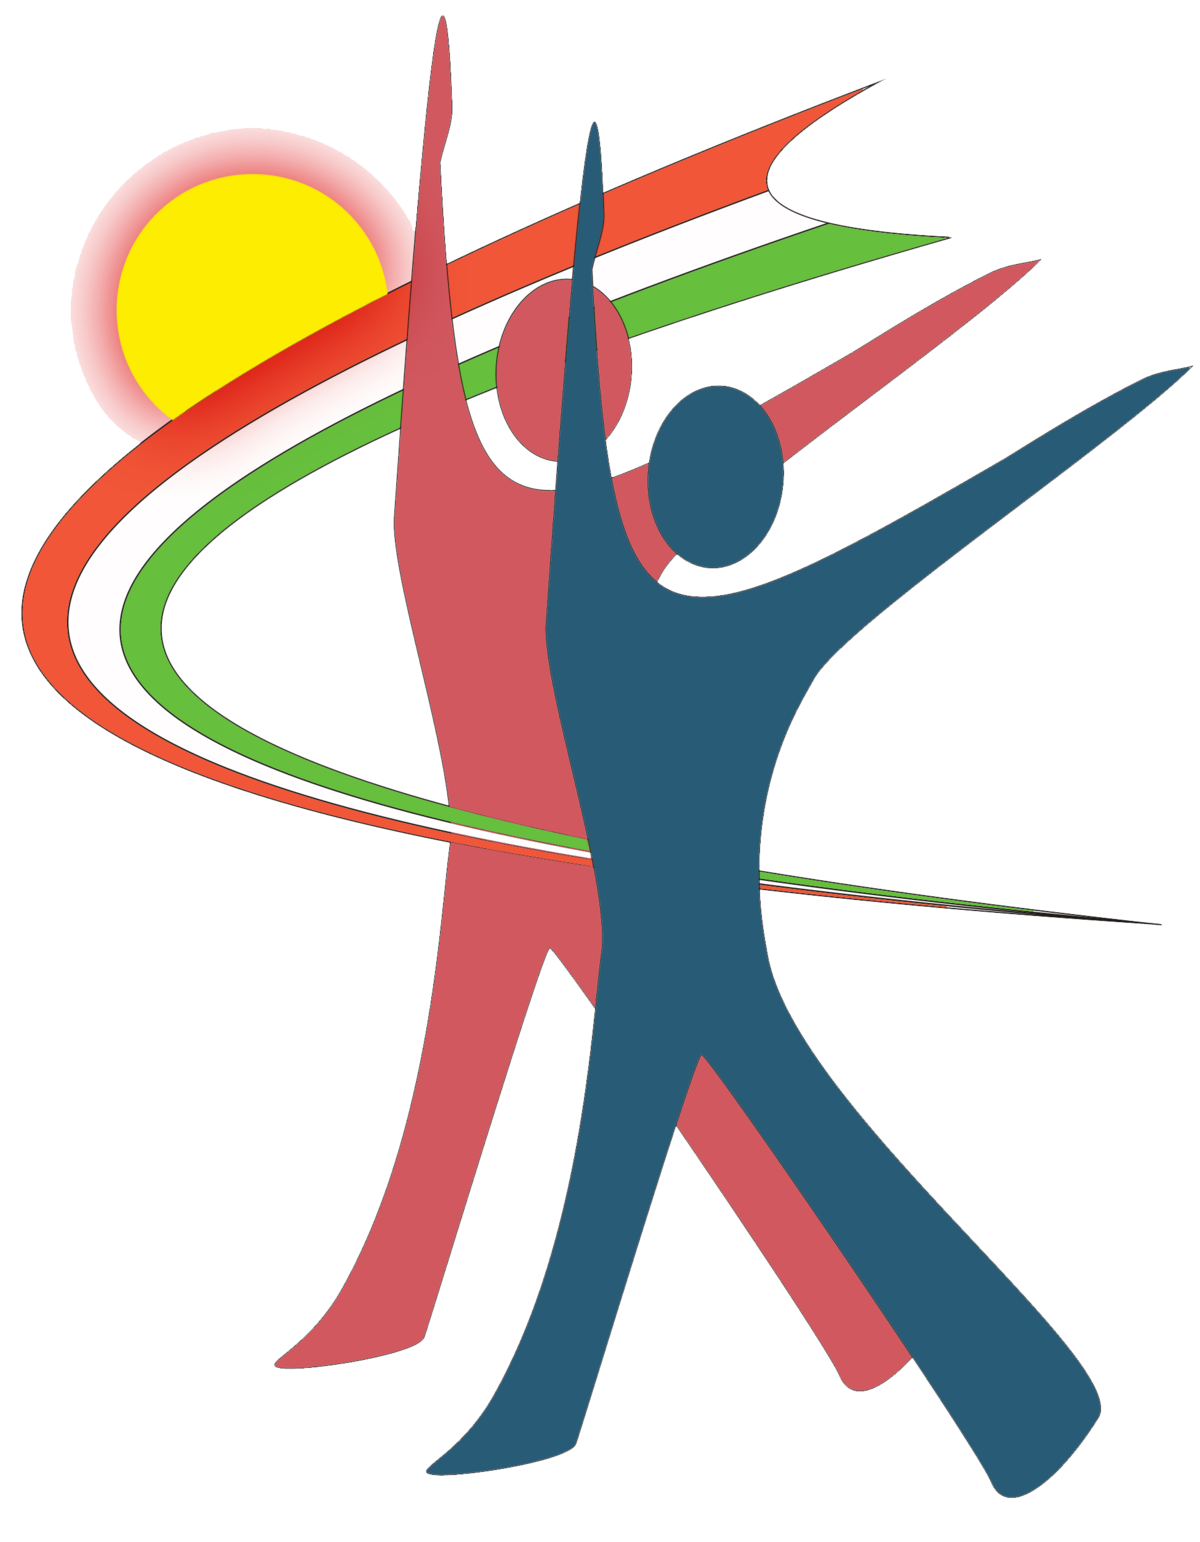 Kartavya wikipedia . Organization clipart contents page